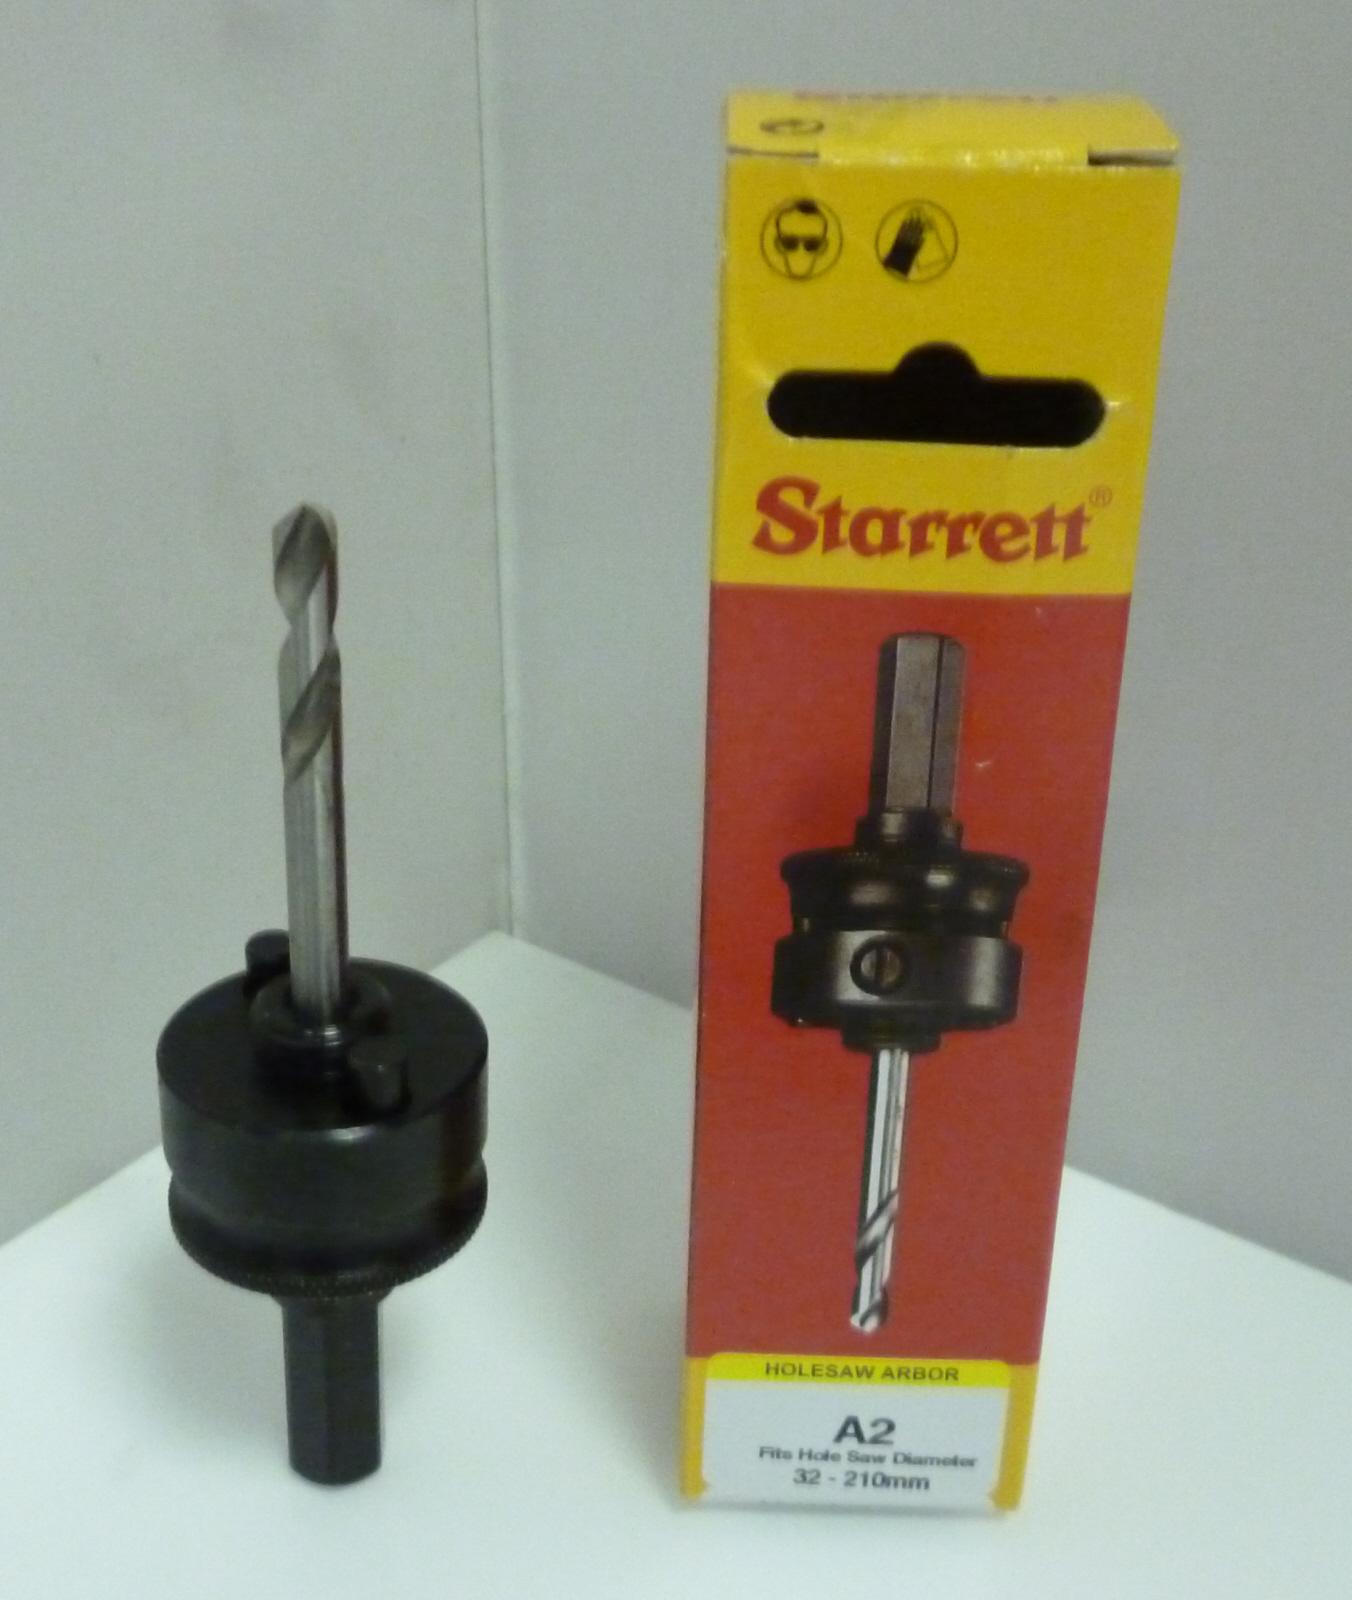 Starrett A2 Arbor to Suit 32mm-210mm Holesaws